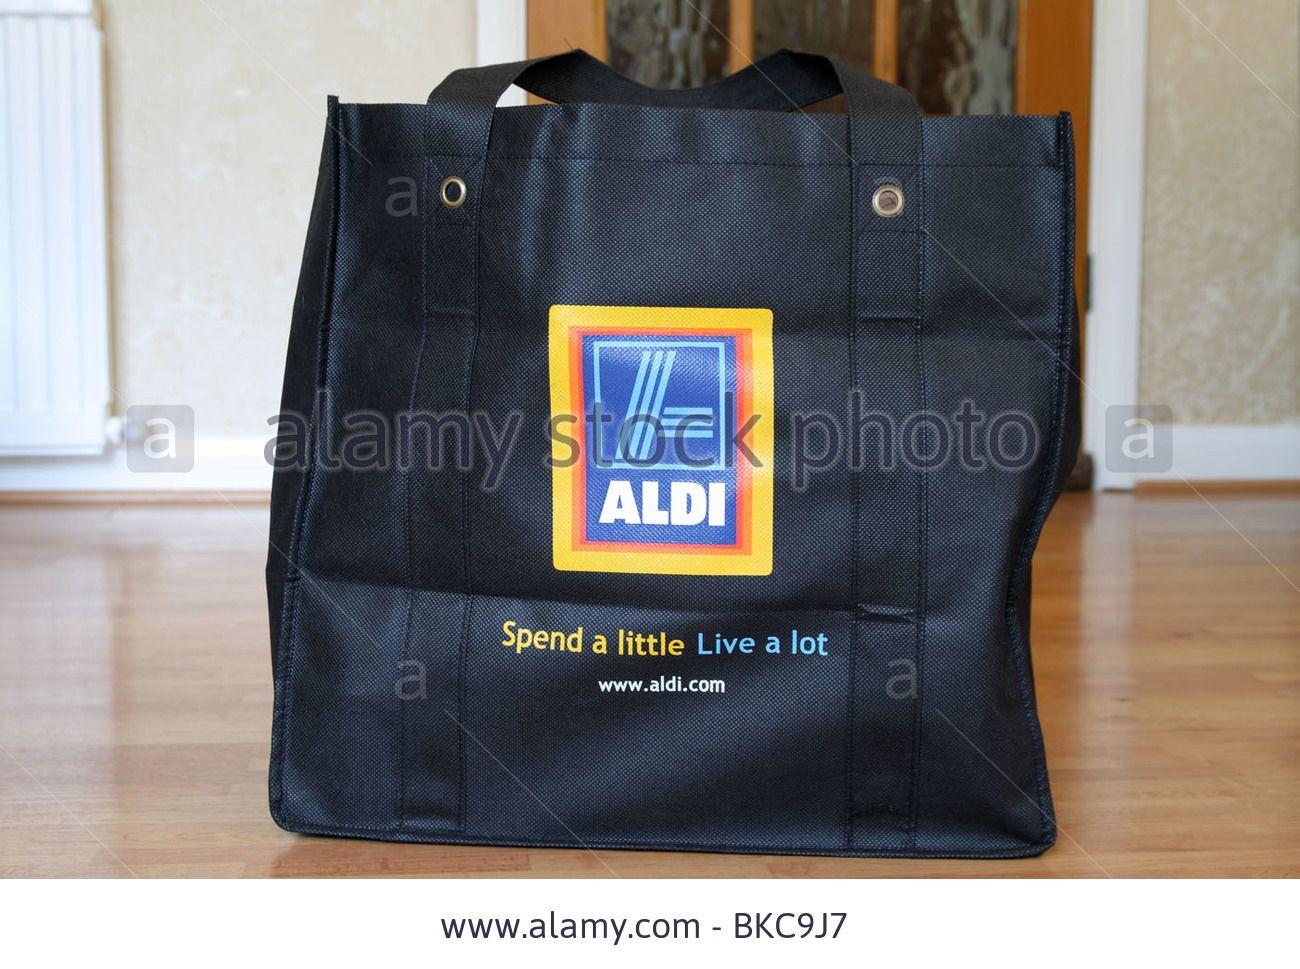 aldi shopping bag - Google Search